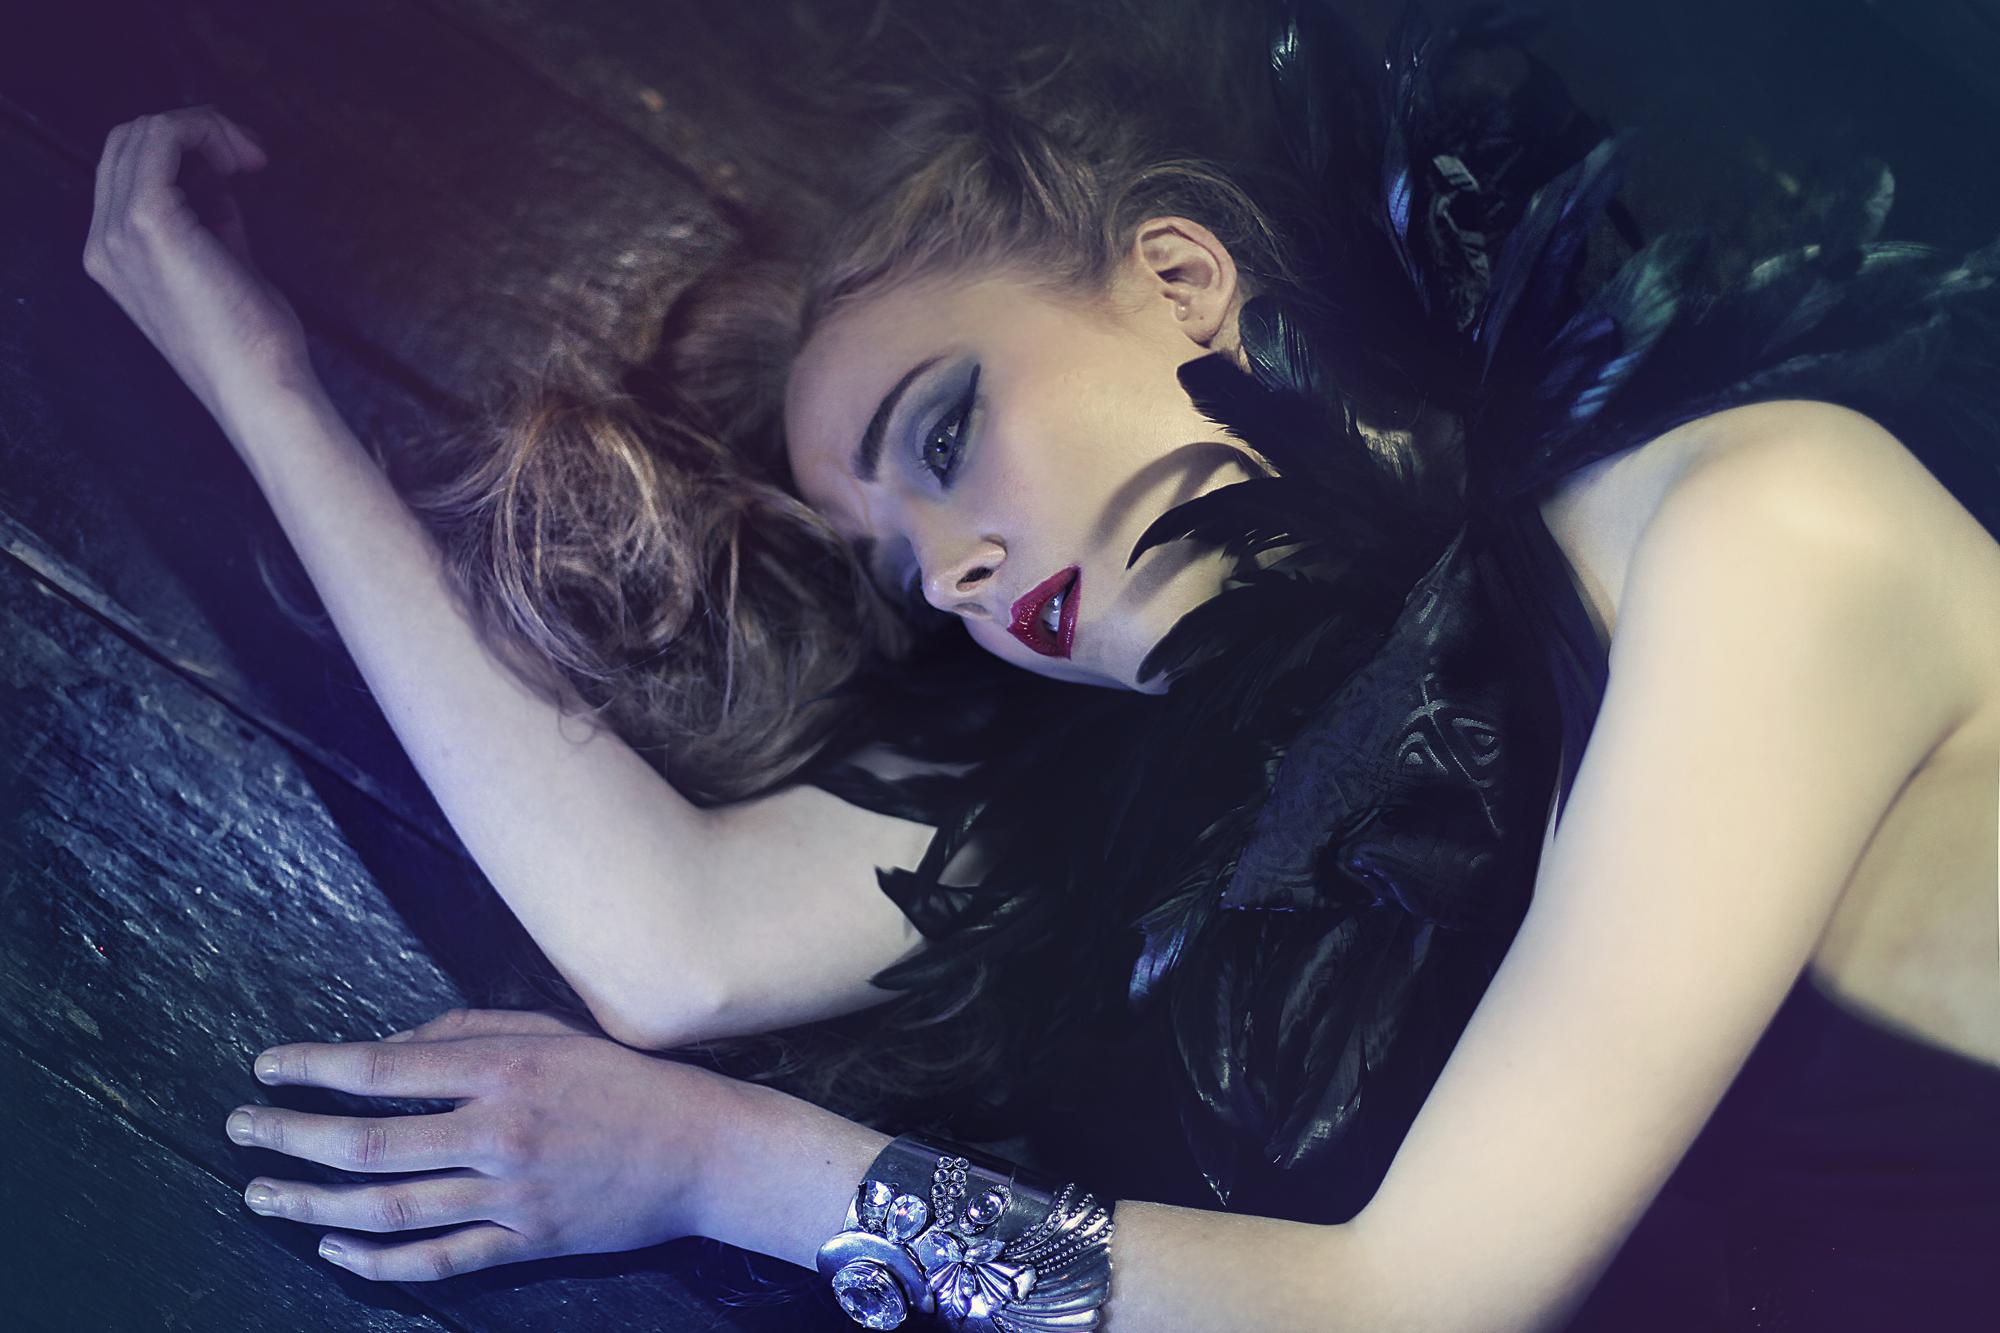 Ryan Vincent D'Alessandro - h Sandra de silva Make up and hair style - mua Neesha Rahman Makeup artist